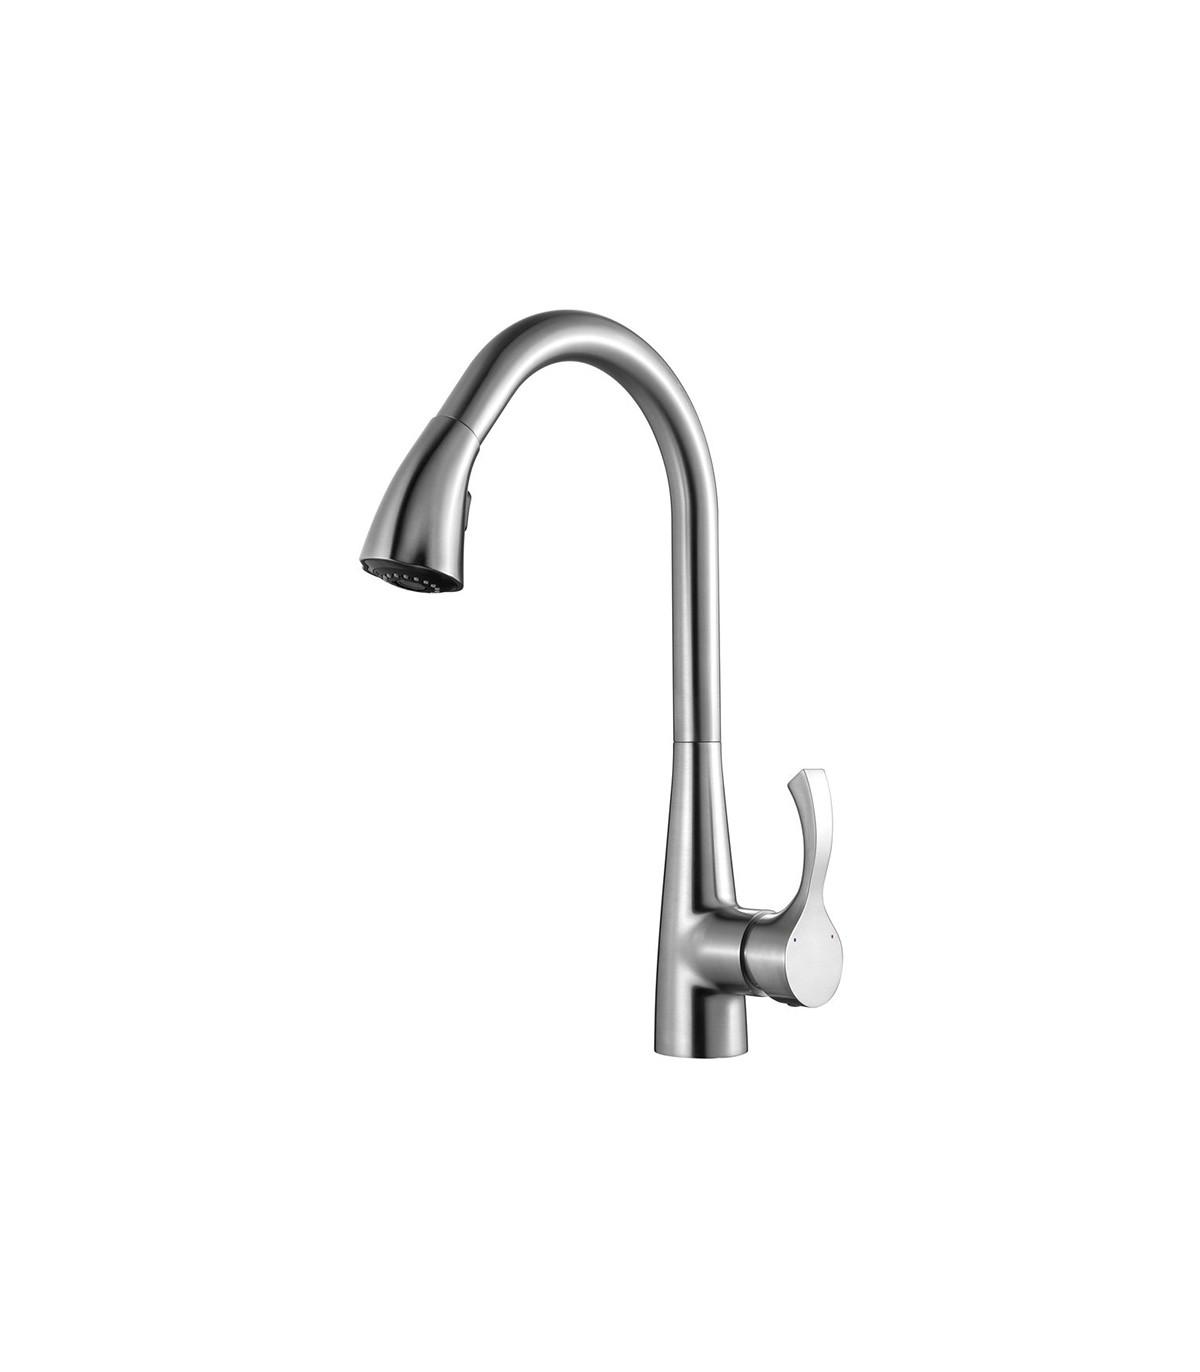 LS-KF2 Kitchen Faucet Brushed Nickel